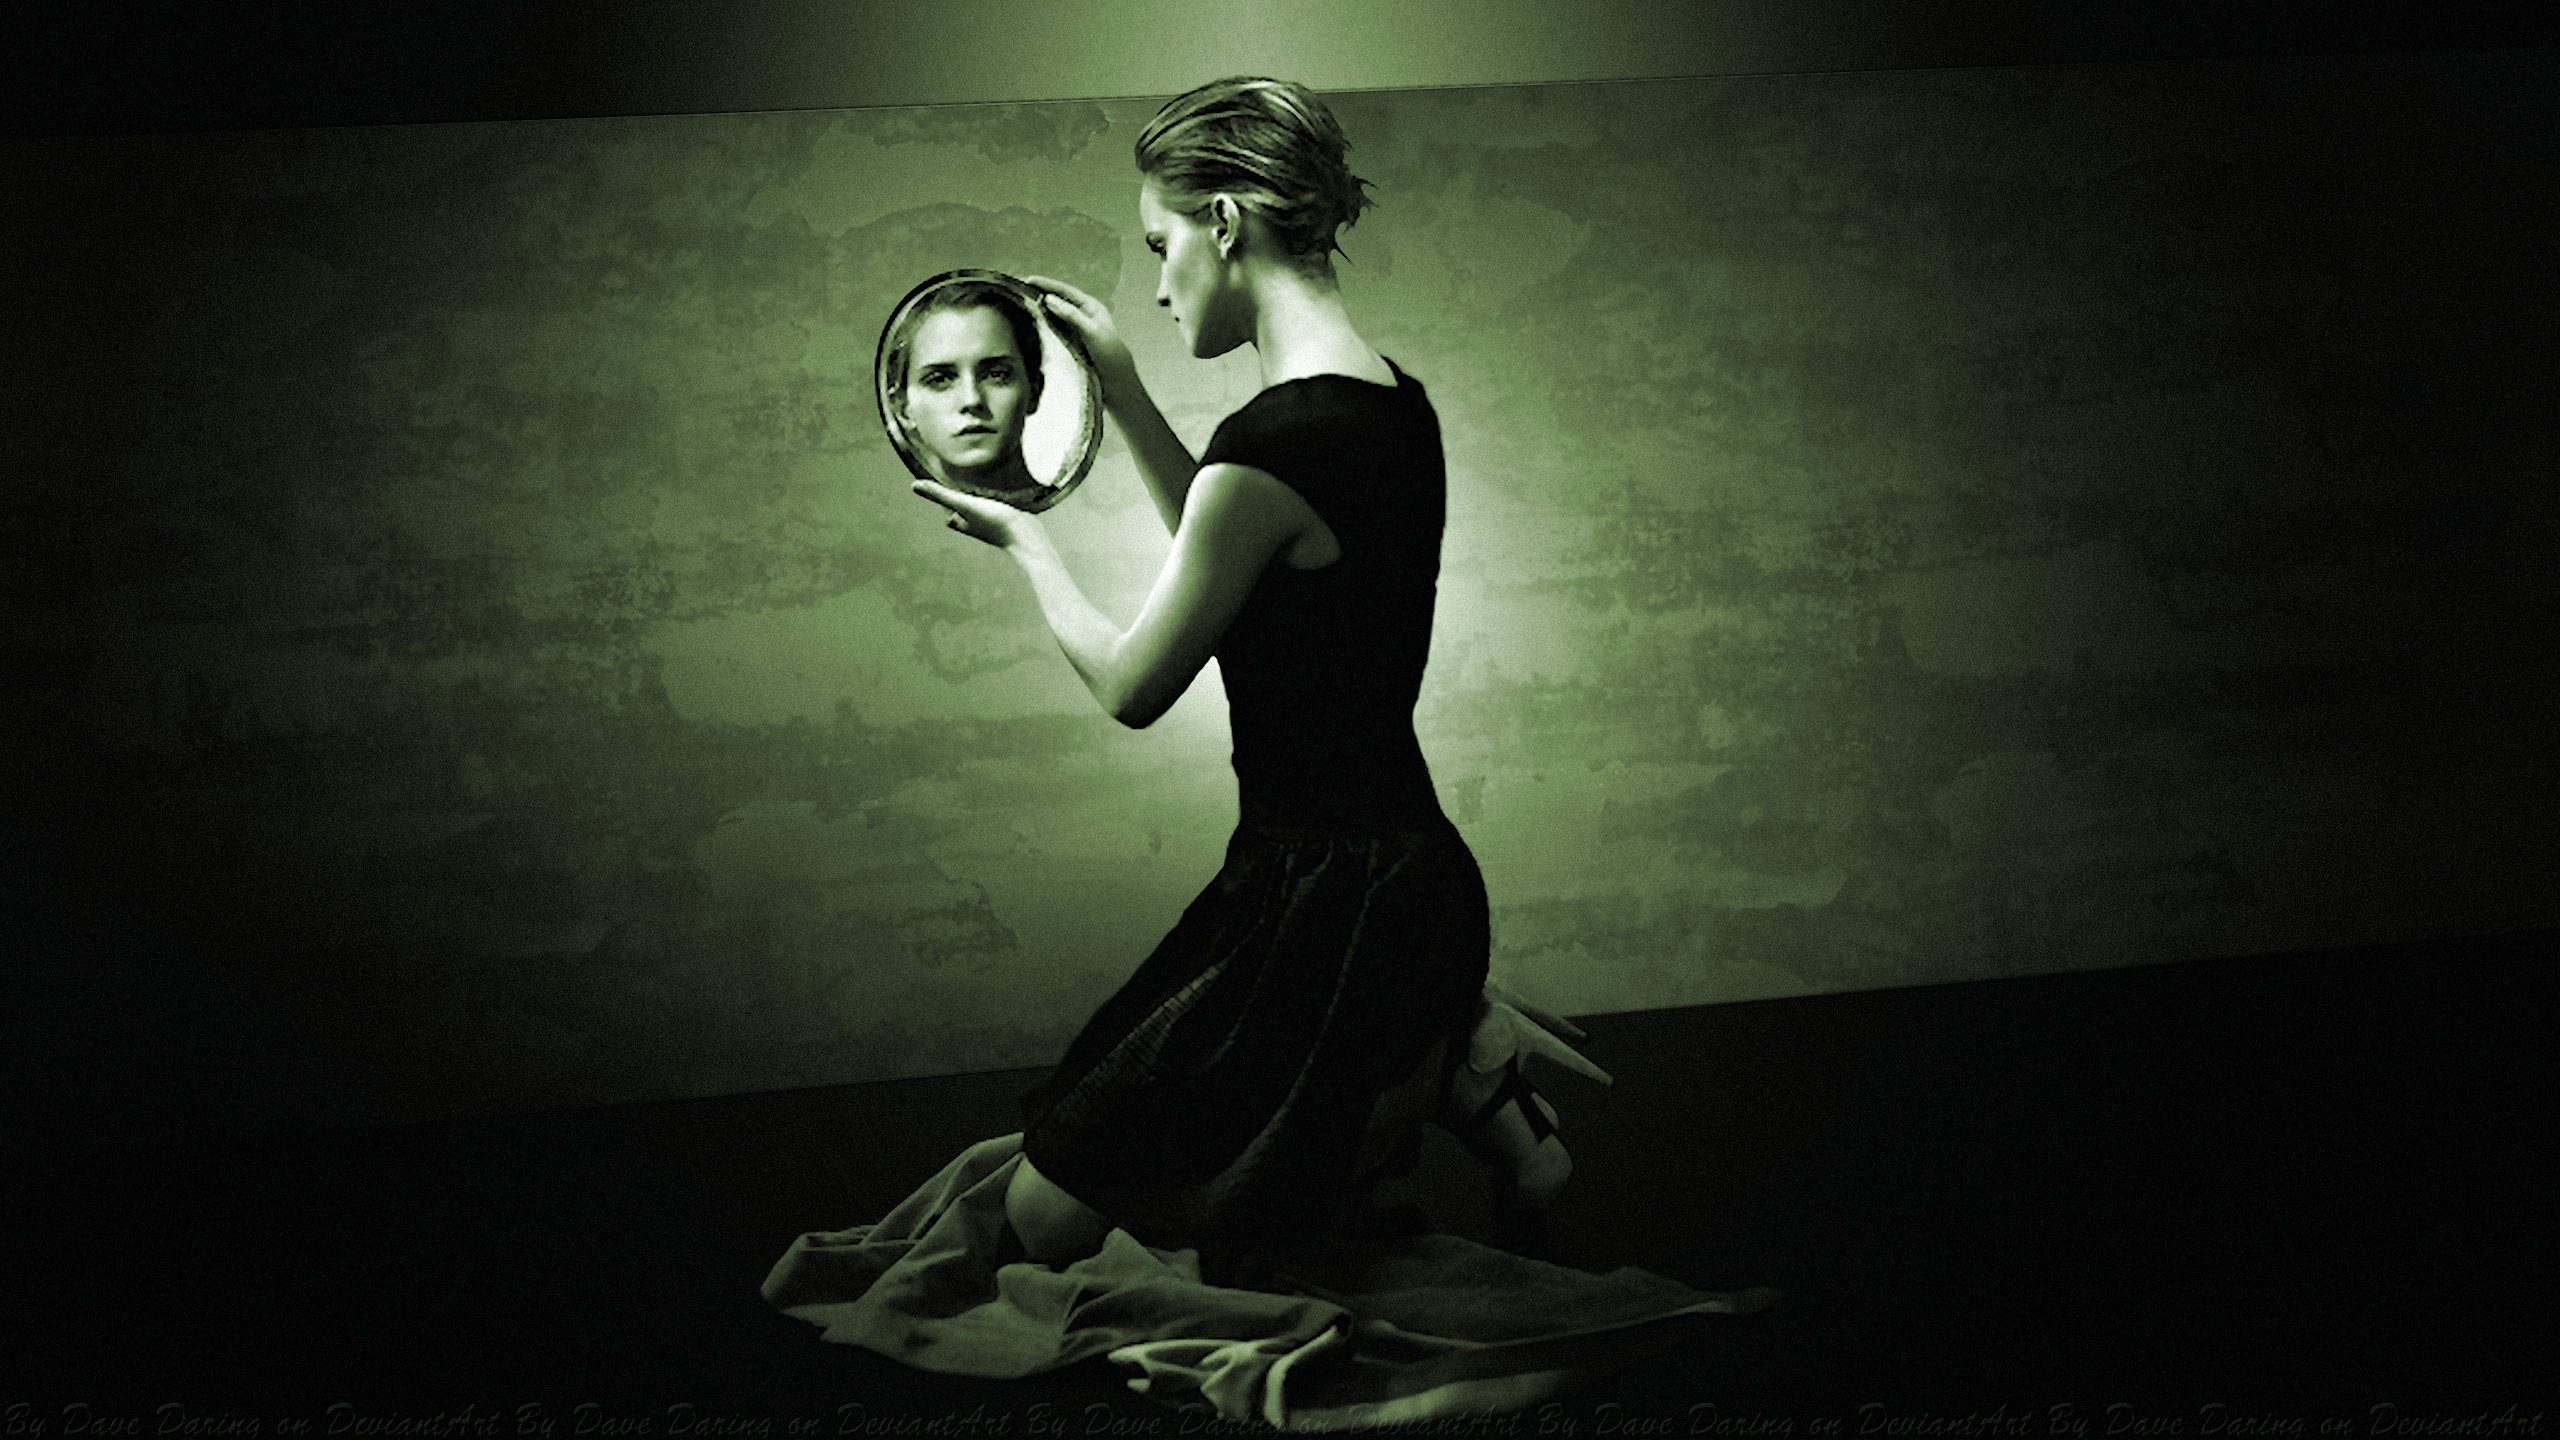 Emma Watson Mirror Mirror 20s Vintage by Dave-Daring